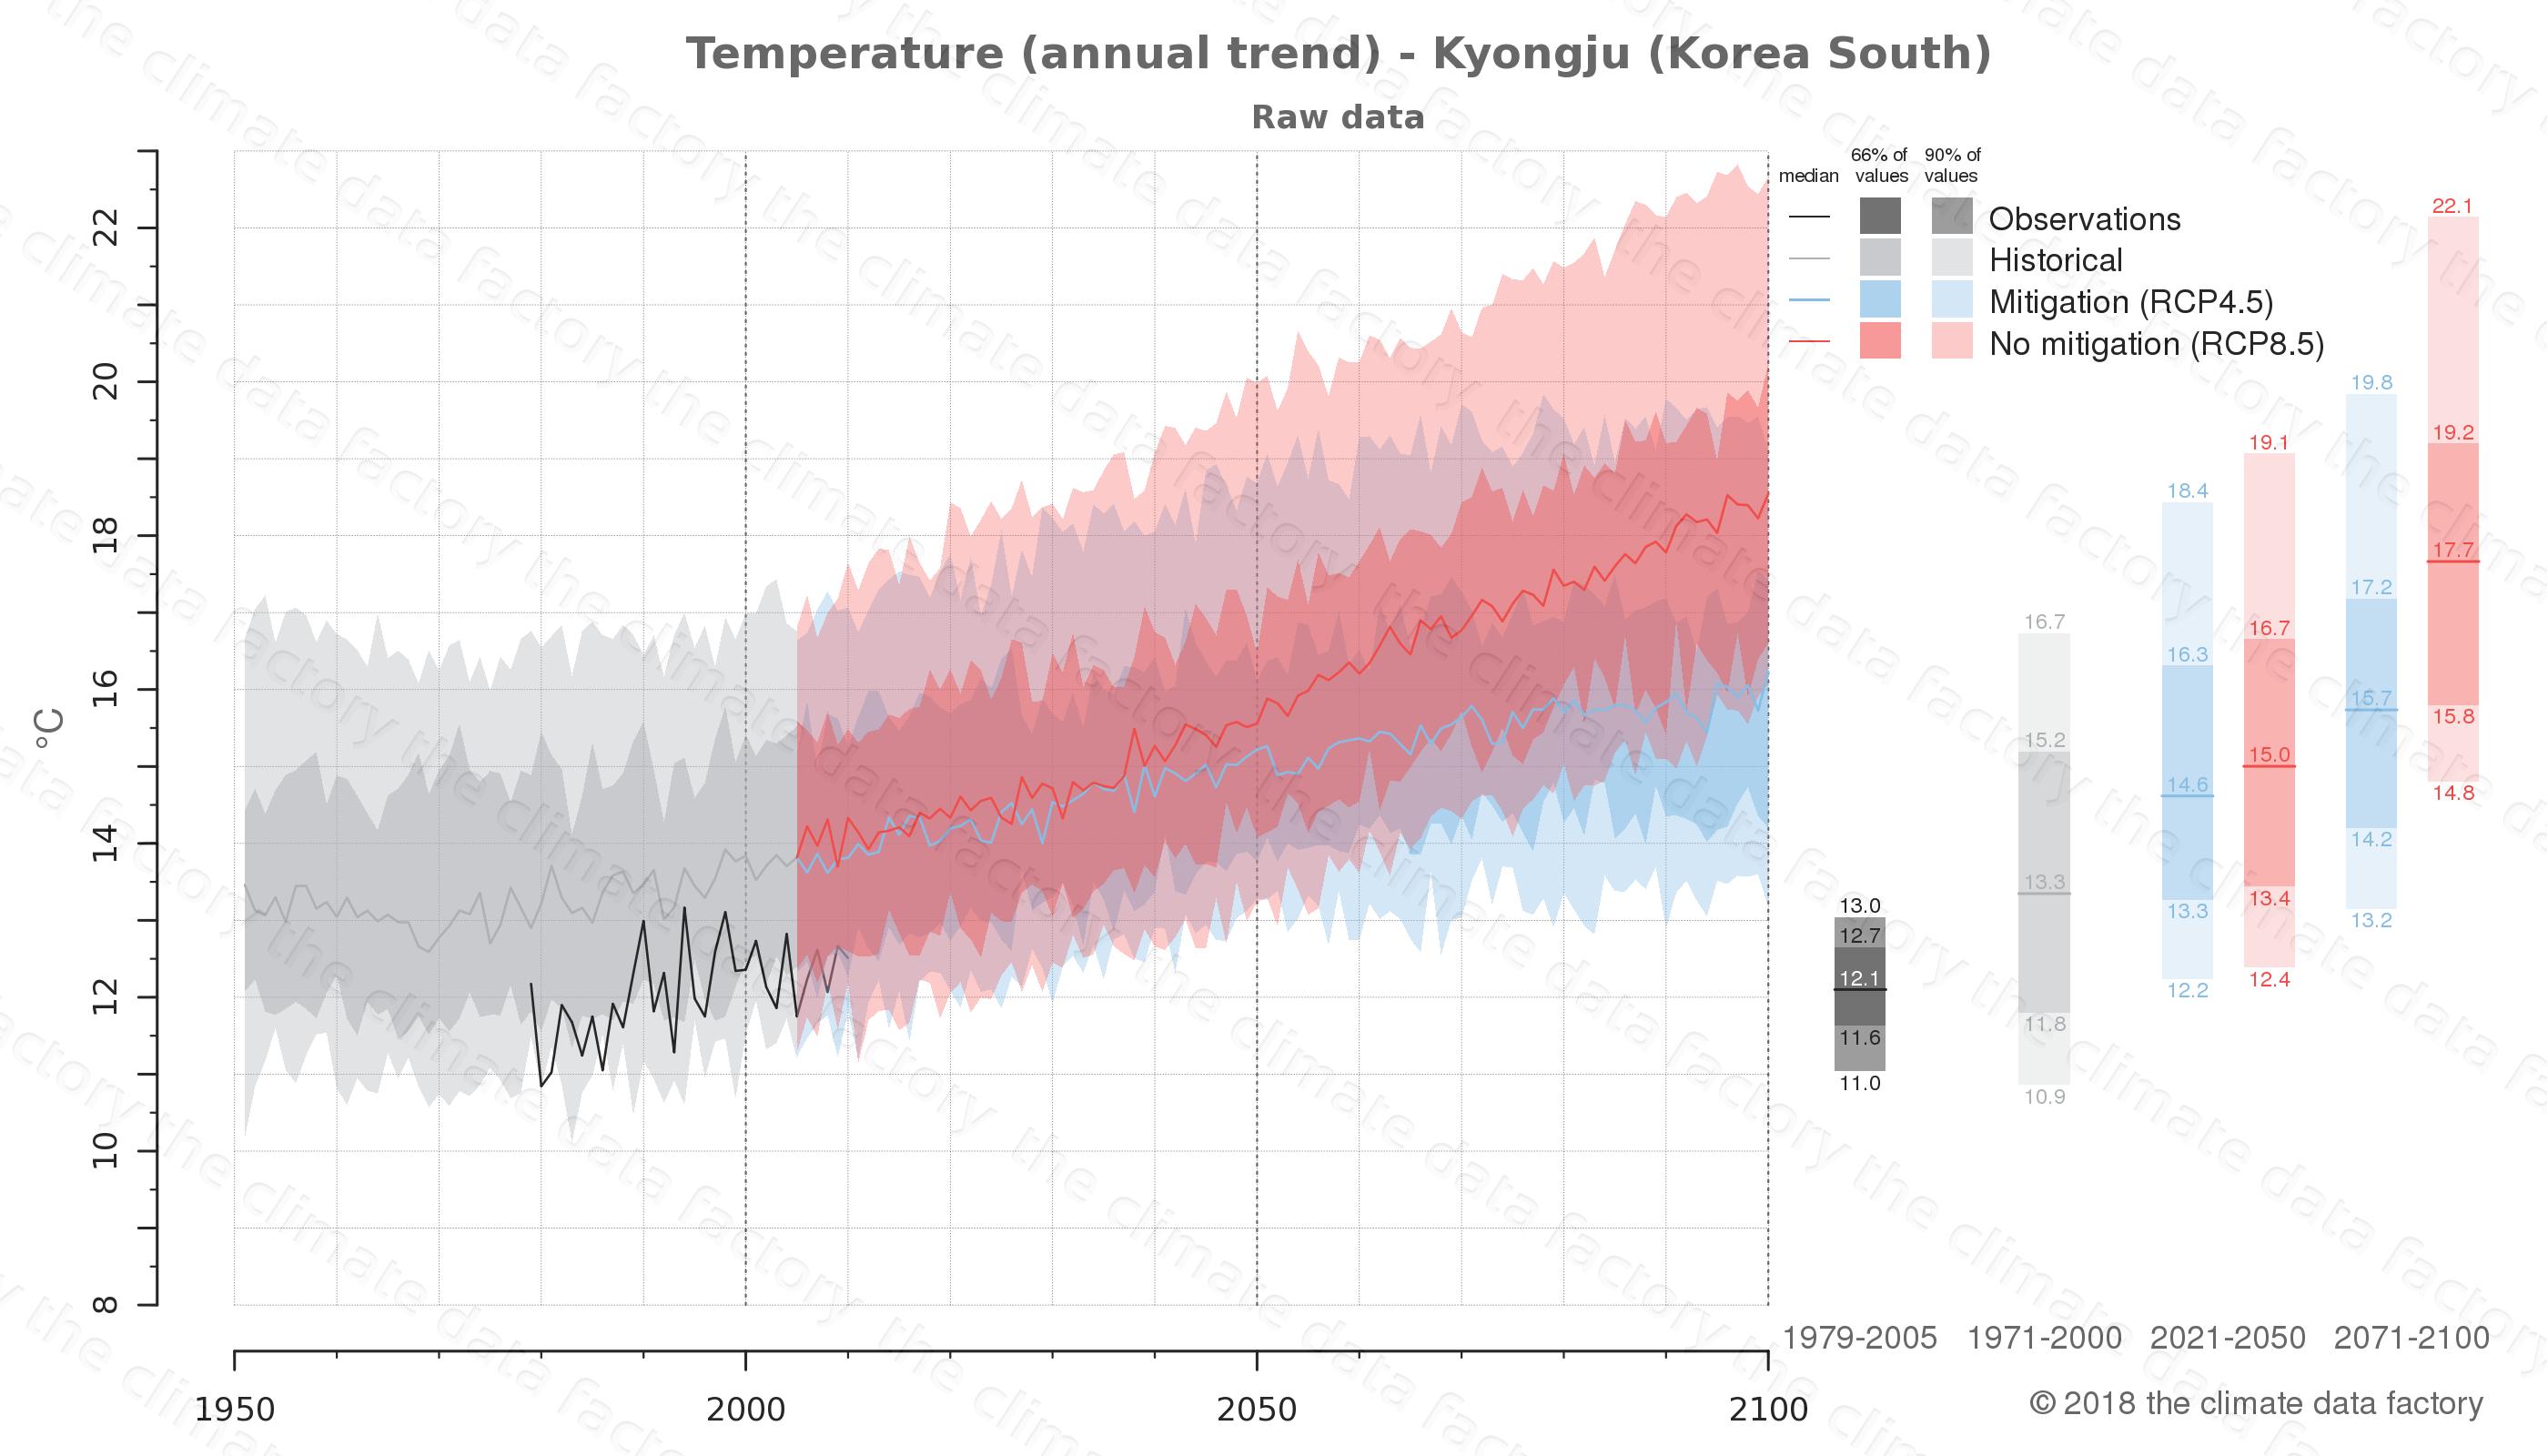 climate change data policy adaptation climate graph city data temperature kyongju south korea